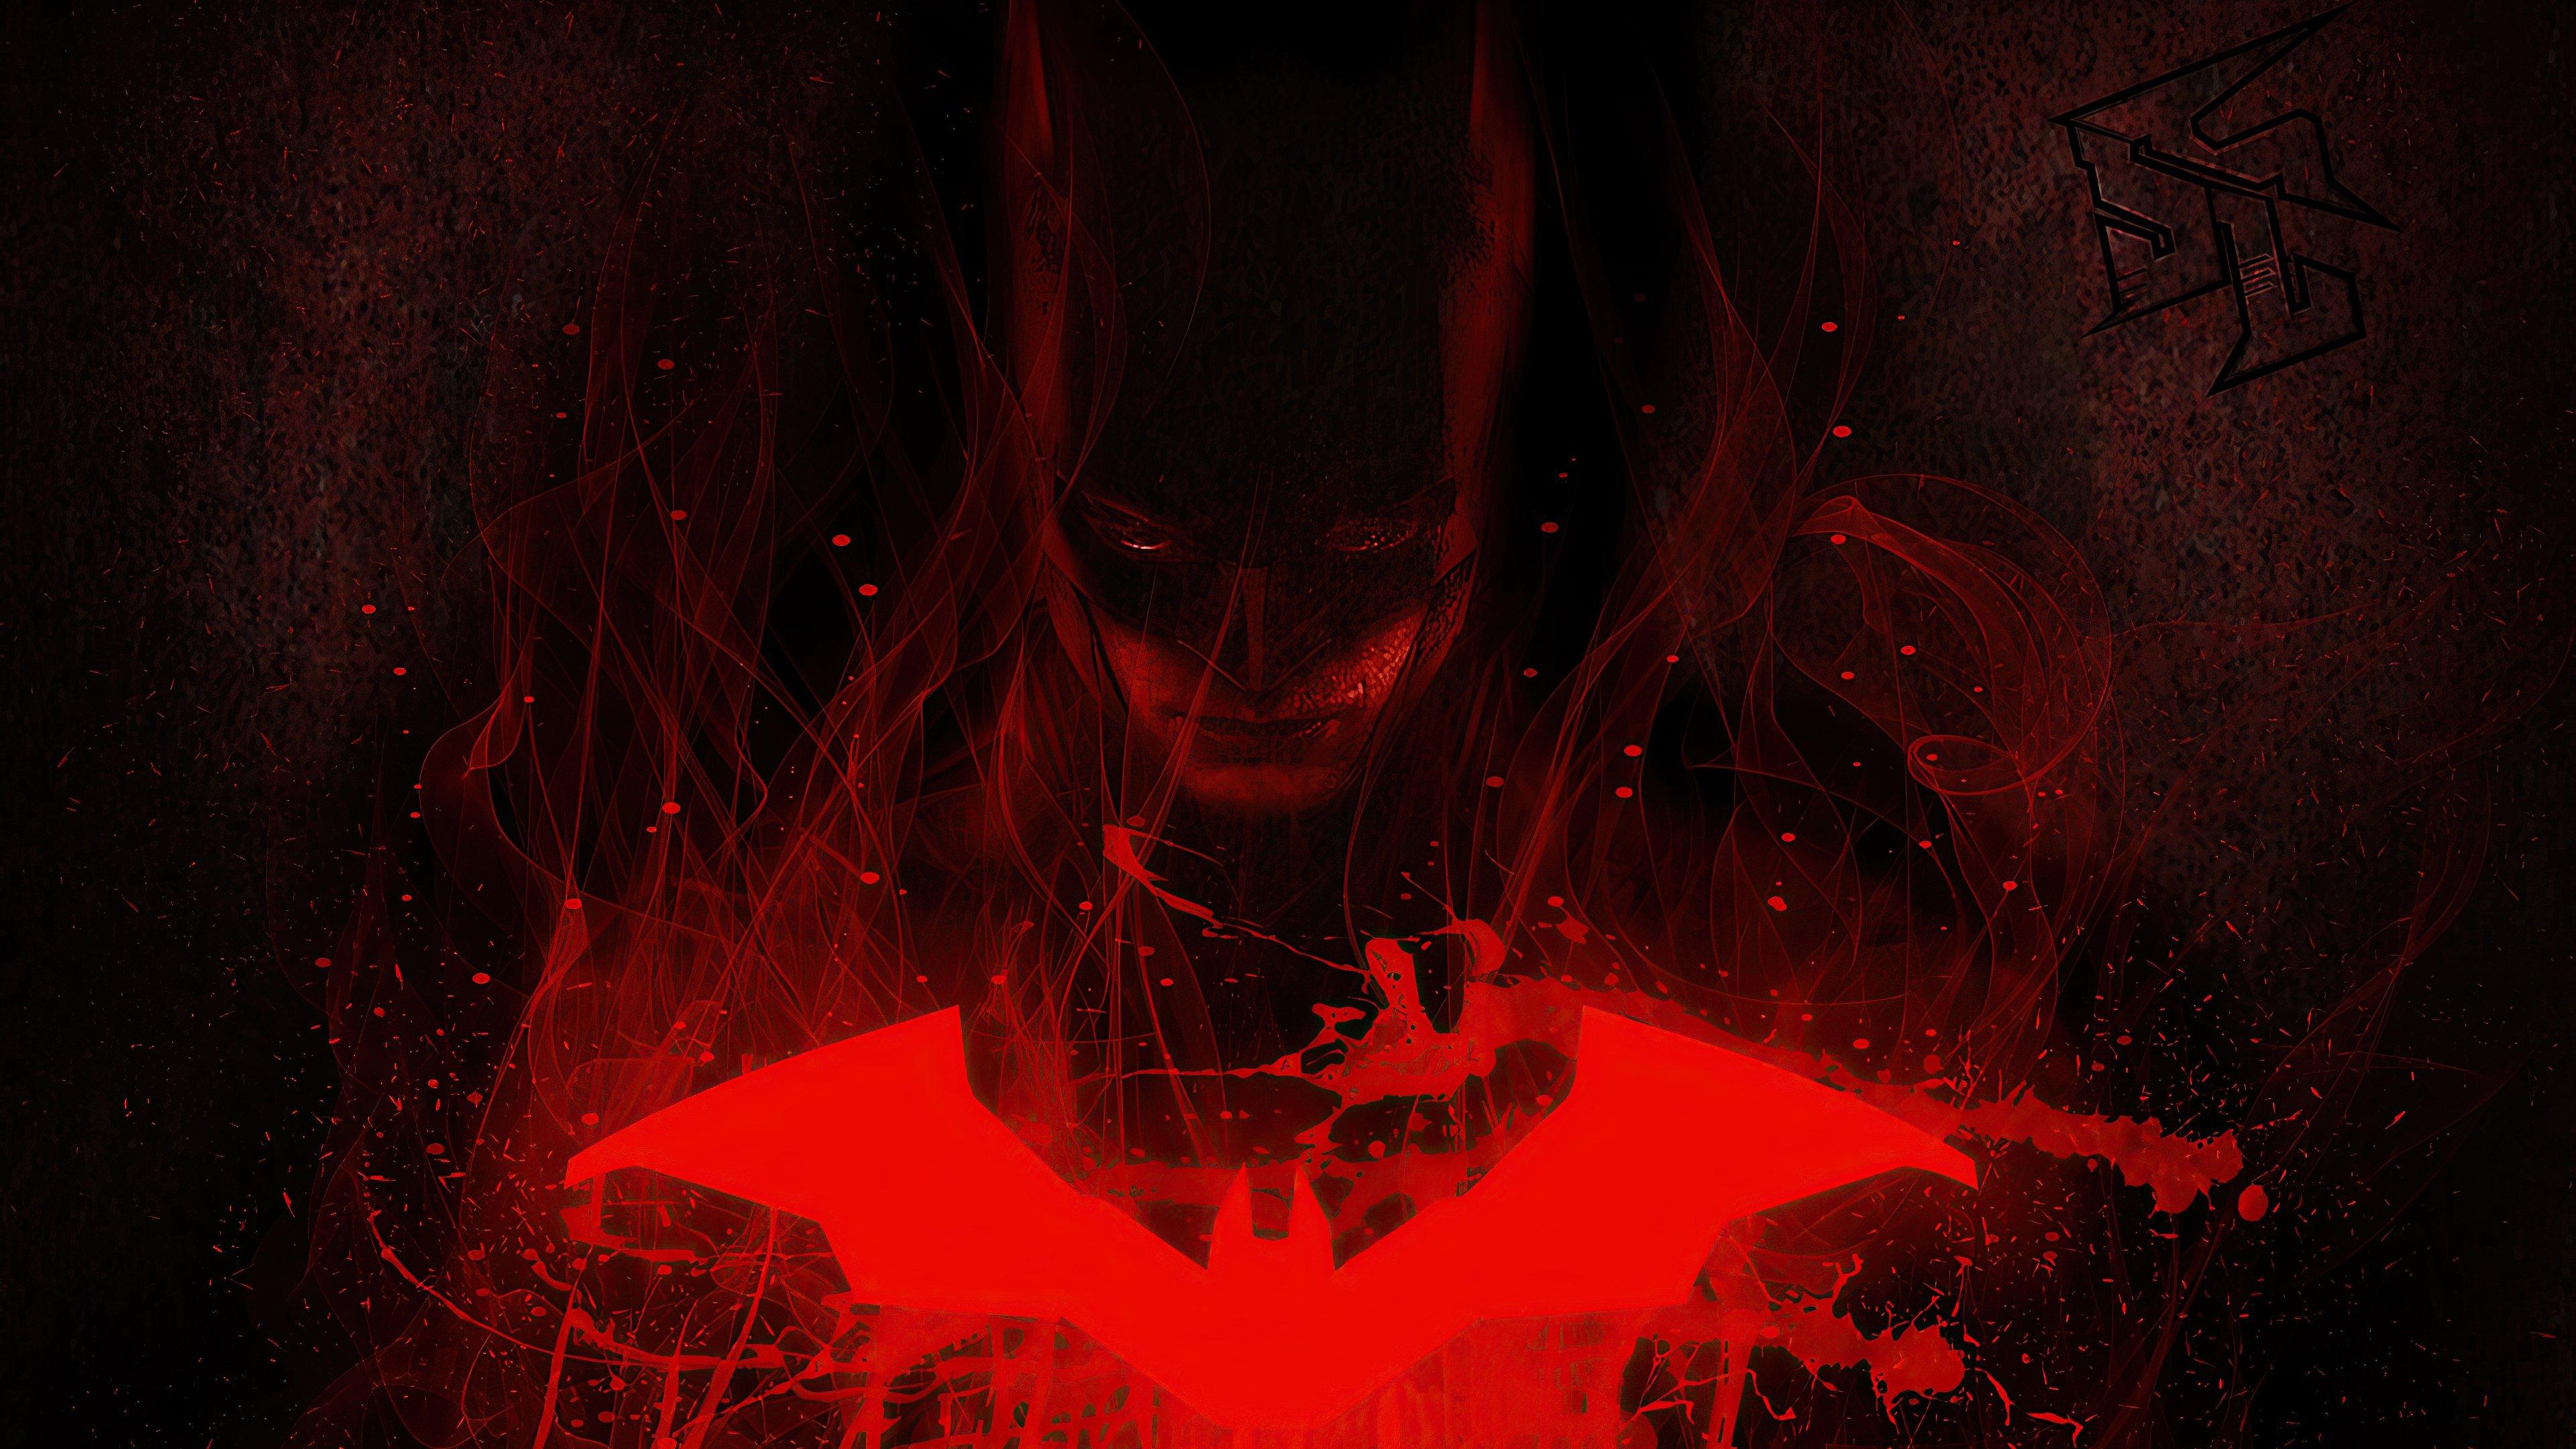 Wallpaper The Batman in red